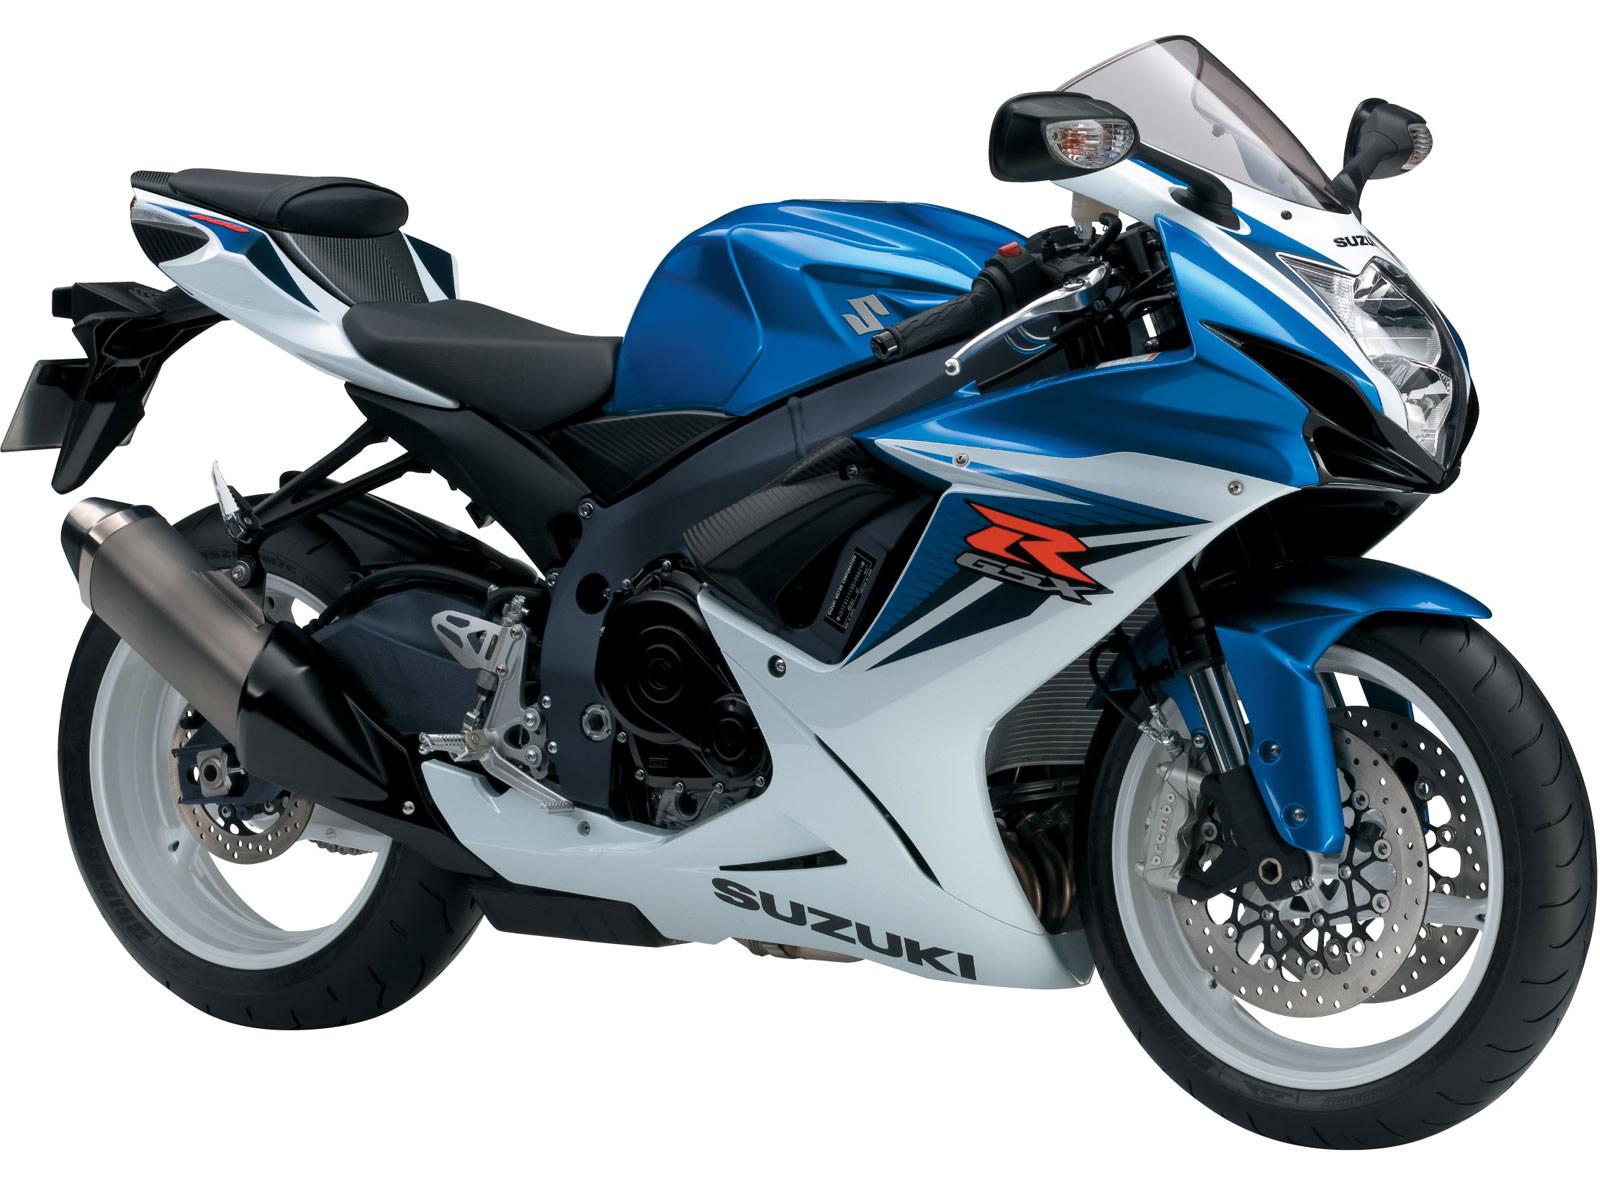 http://3.bp.blogspot.com/-bJwDkqNRsQU/TuVSlZFXdgI/AAAAAAAAFQA/FaShkIm5S3M/s1600/2011_Suzuki_GSX-R_600_motorcycle-desktop-wallpaper_08.jpg